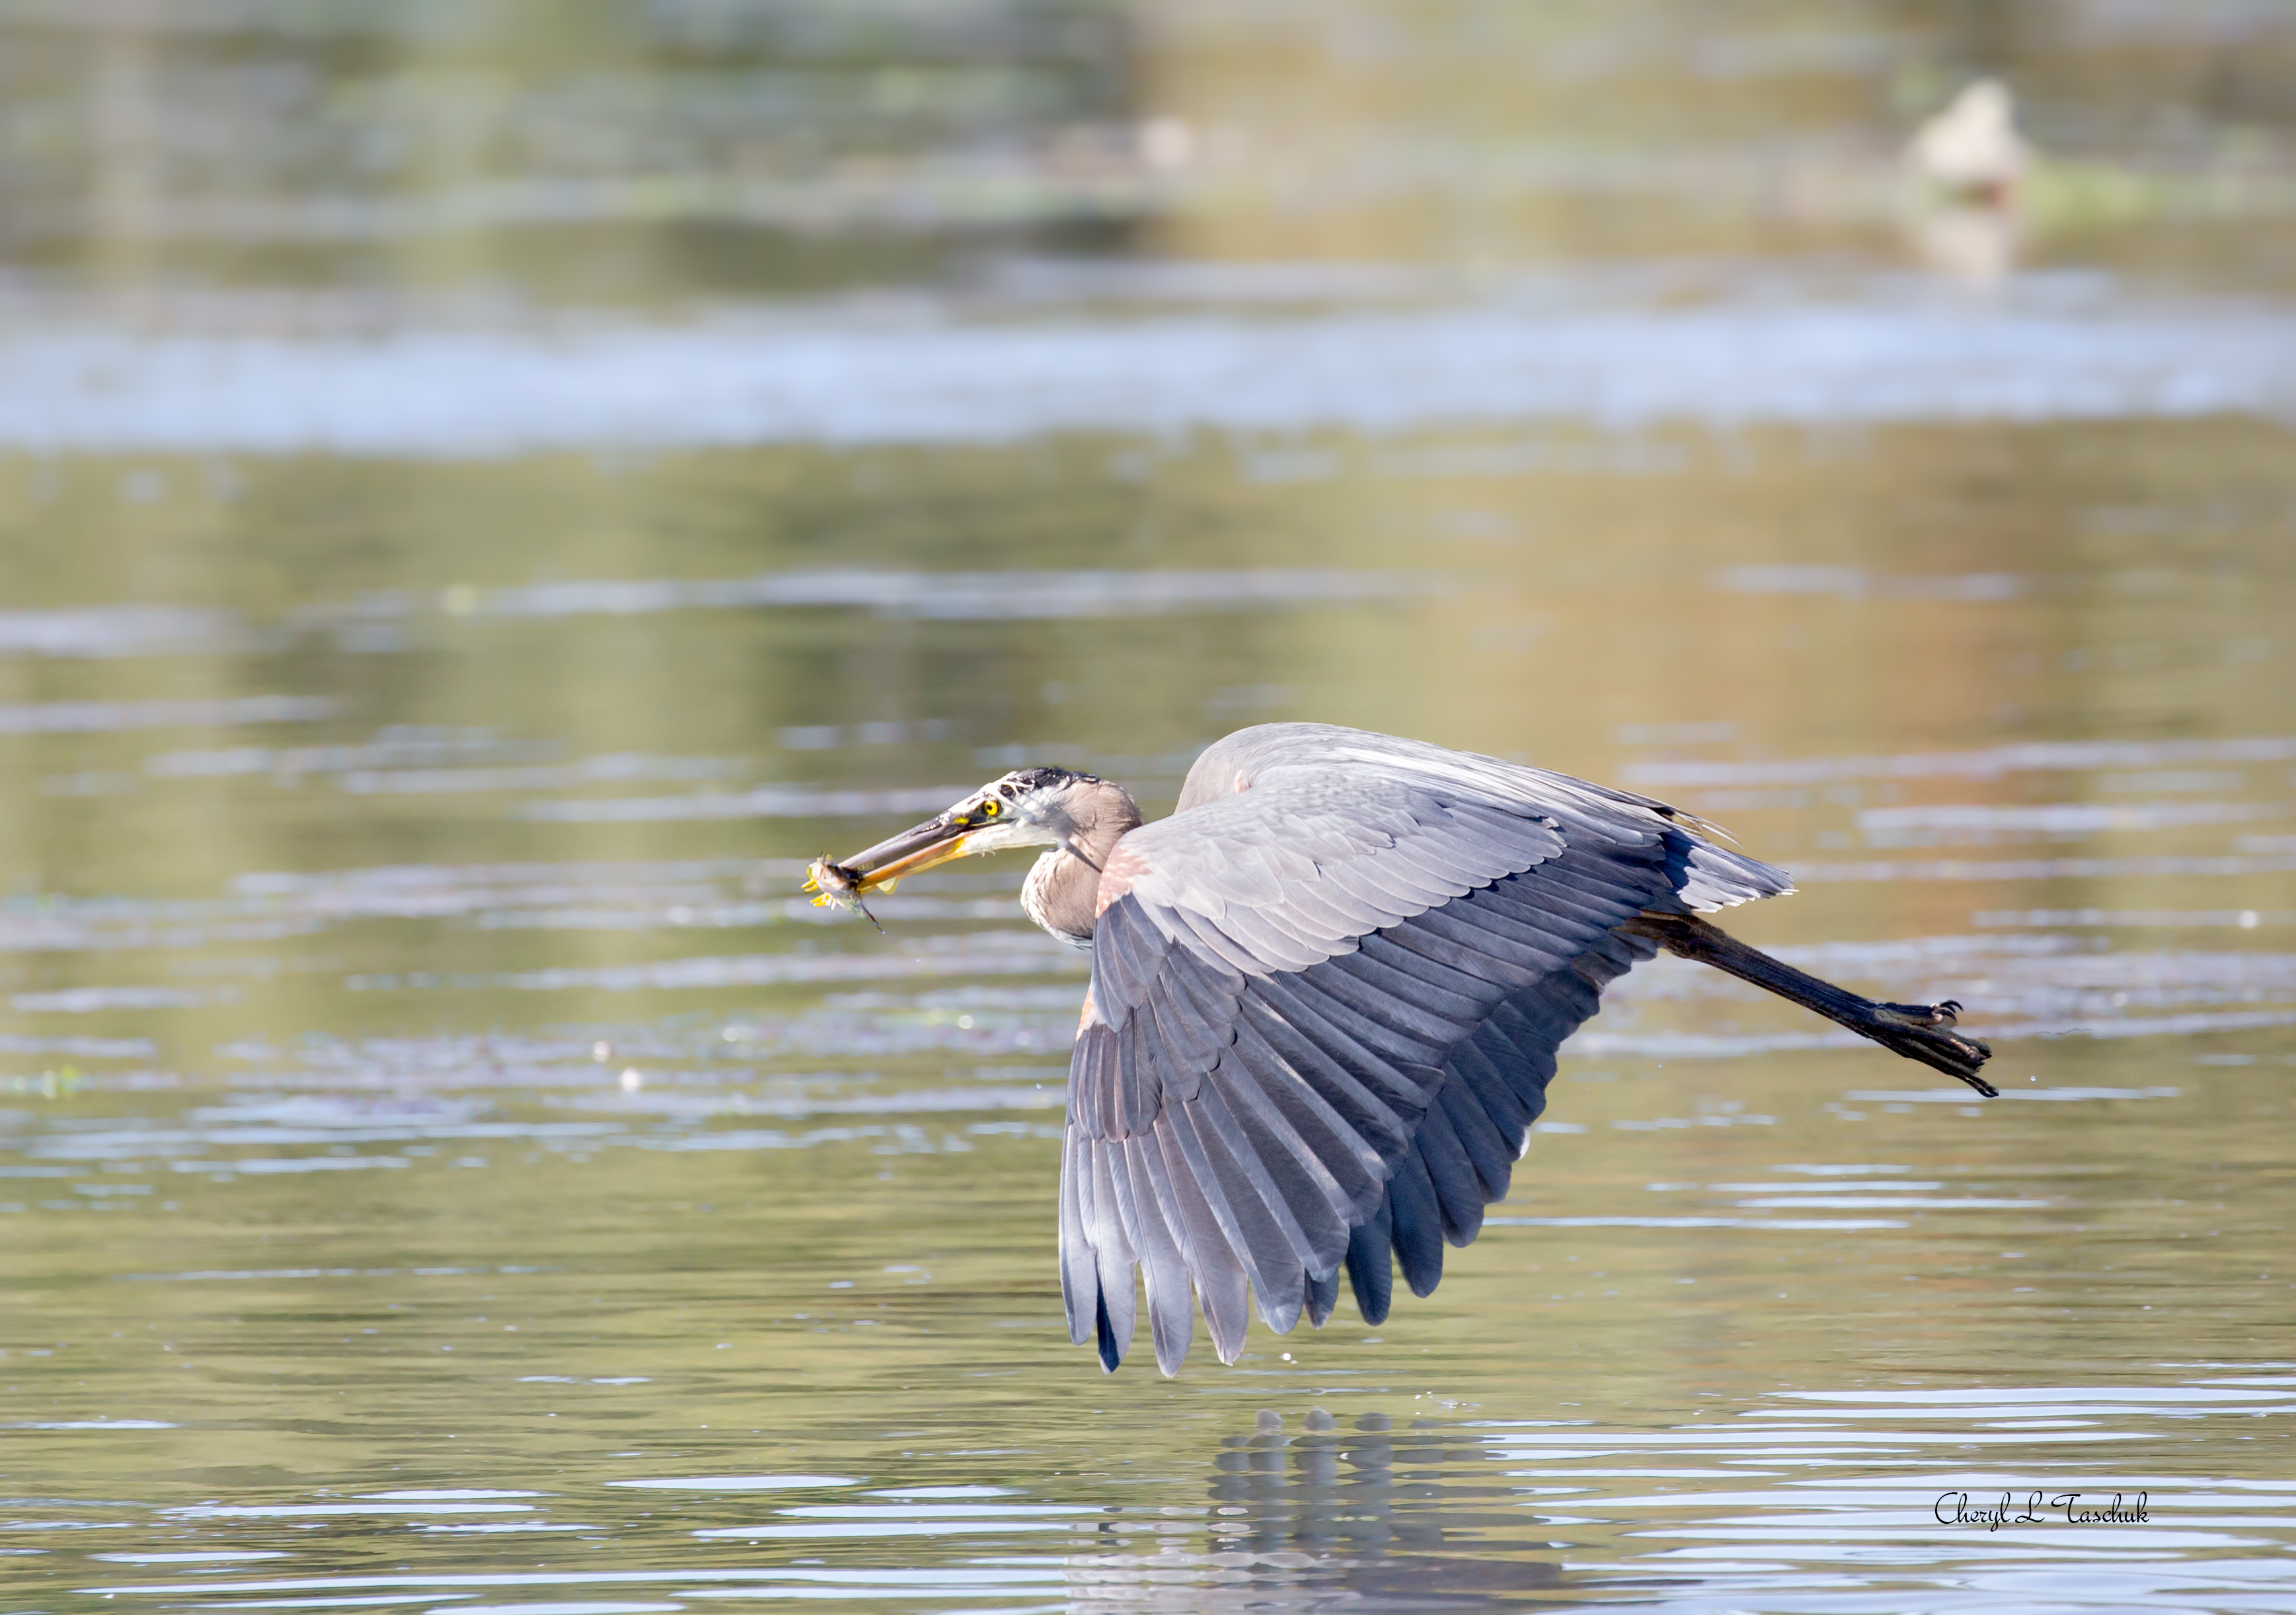 Heron in Flight with Fish